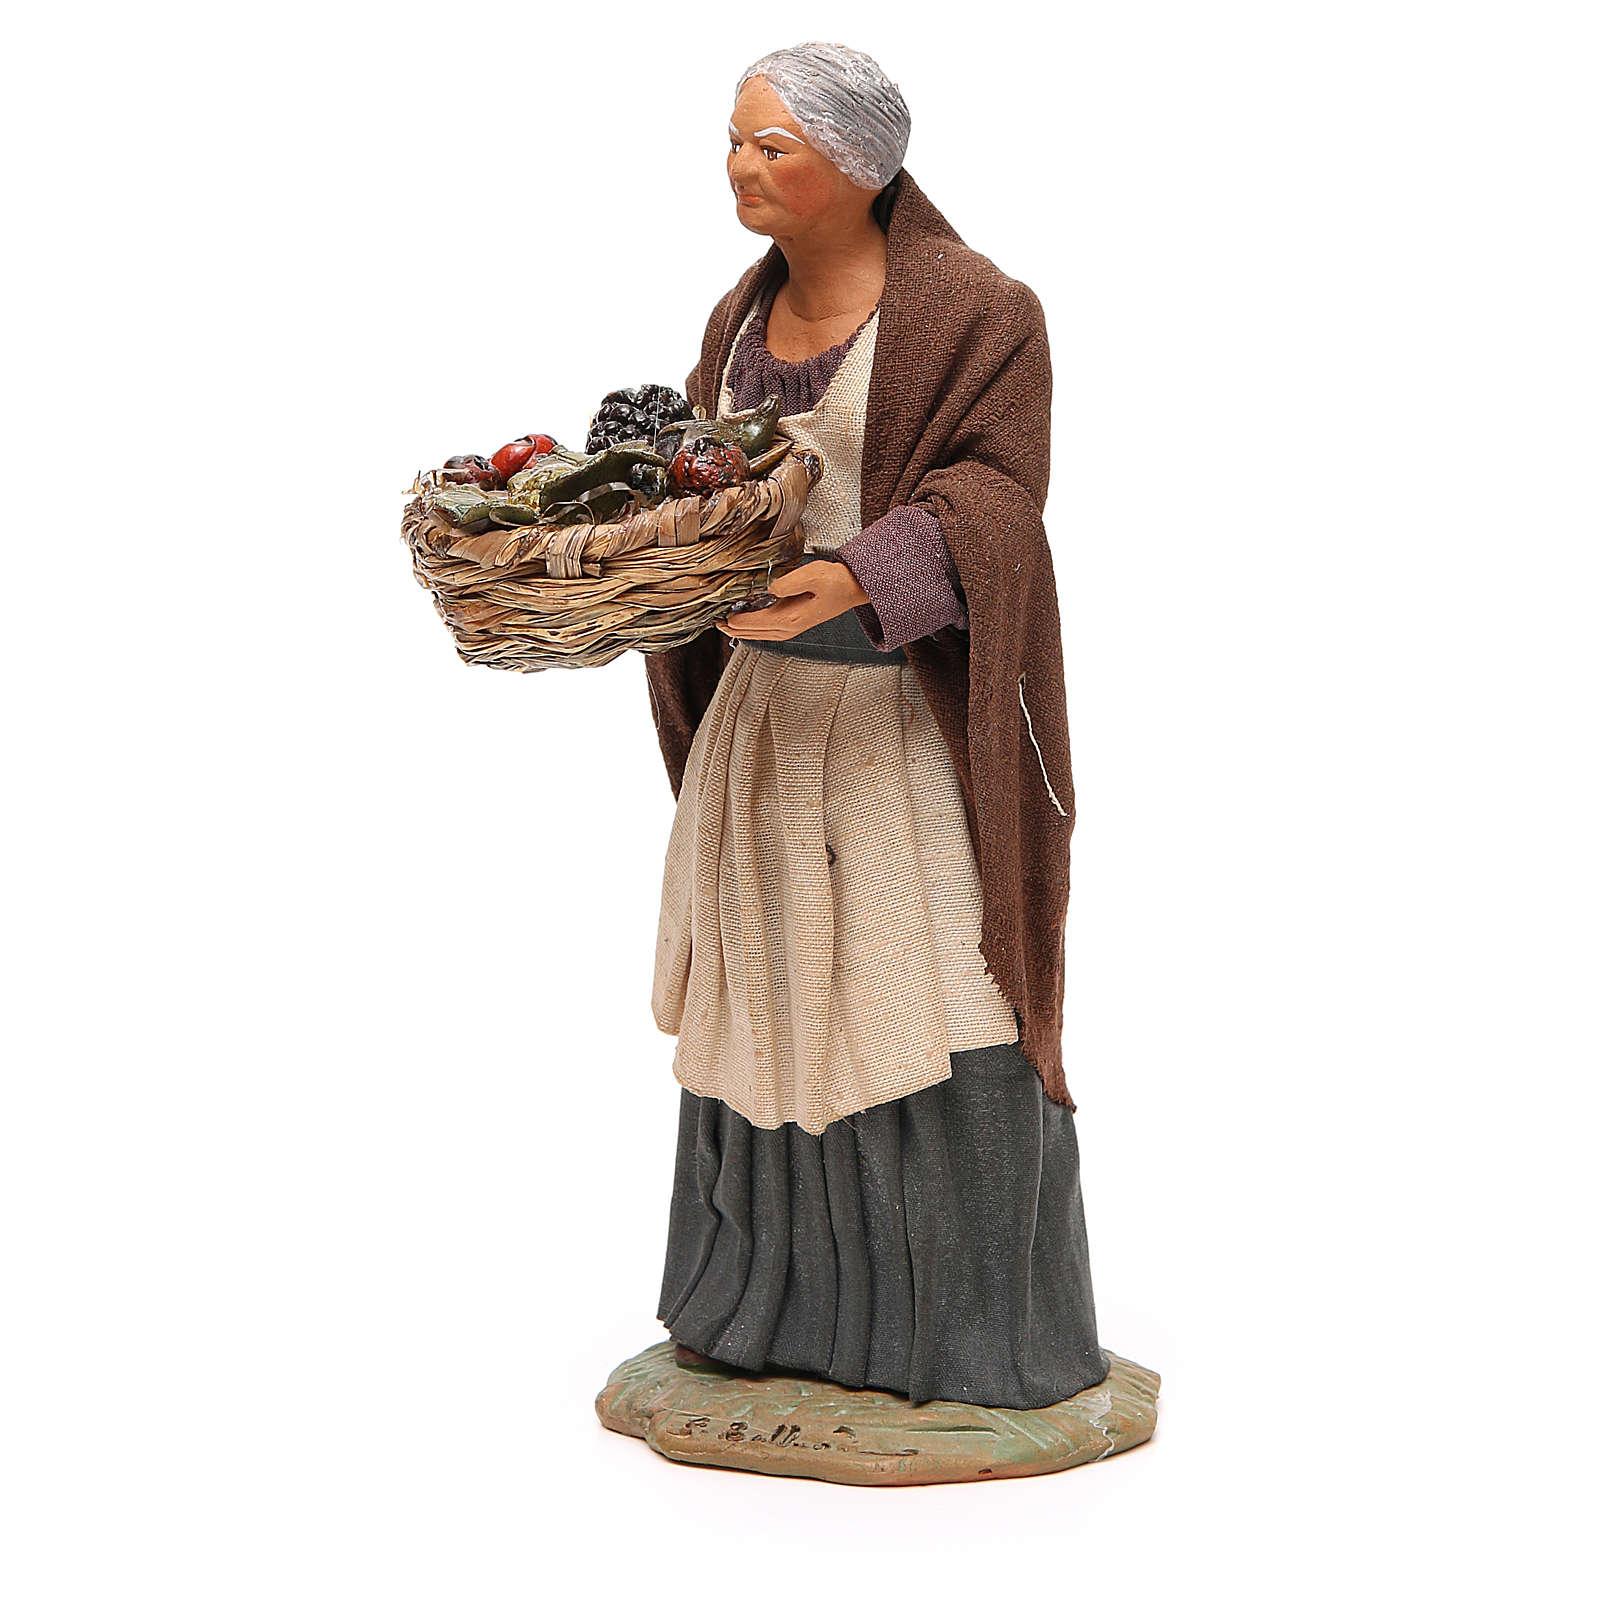 Old lady with fruit basket and straw, Neapolitan nativity figurine 24cm 4